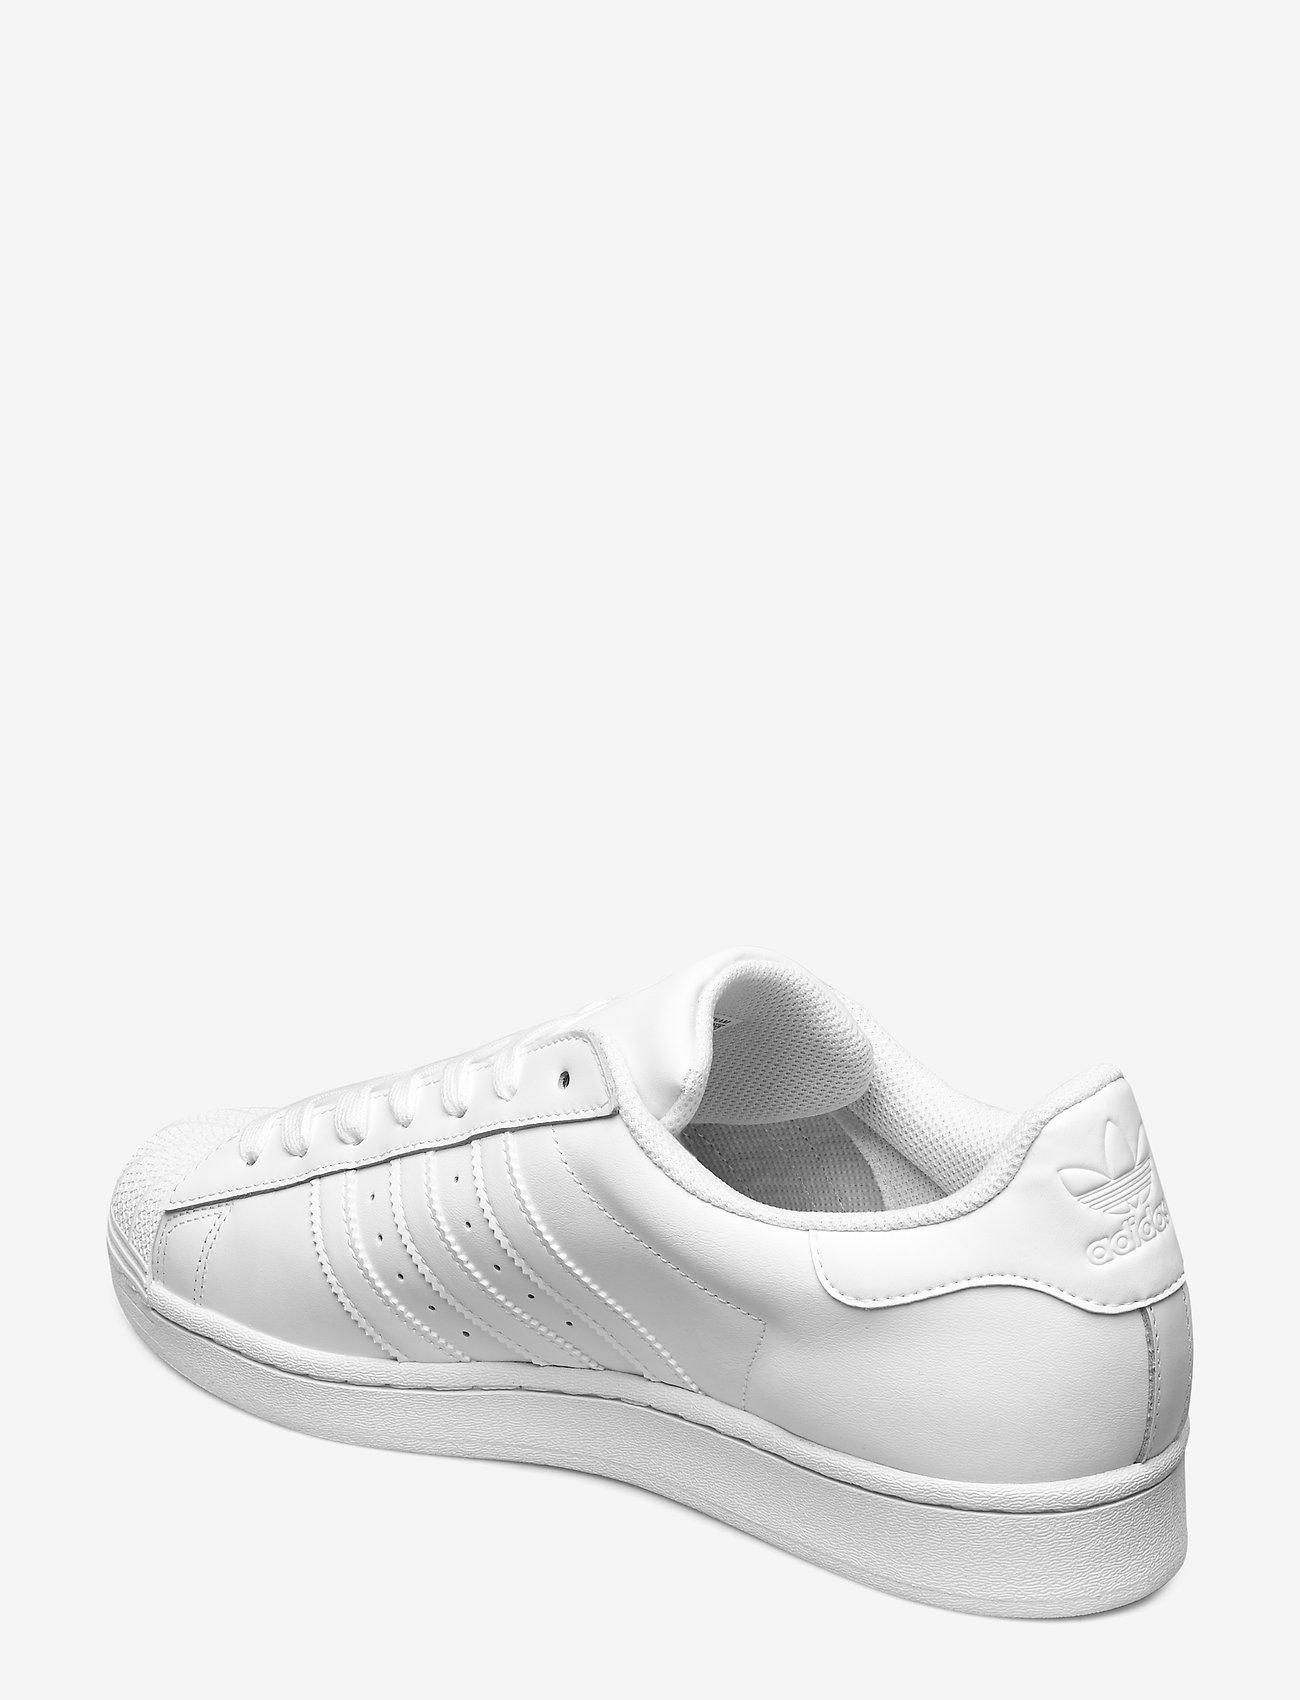 Superstar (Ftwwht/ftwwht/ftwwht) - adidas Originals